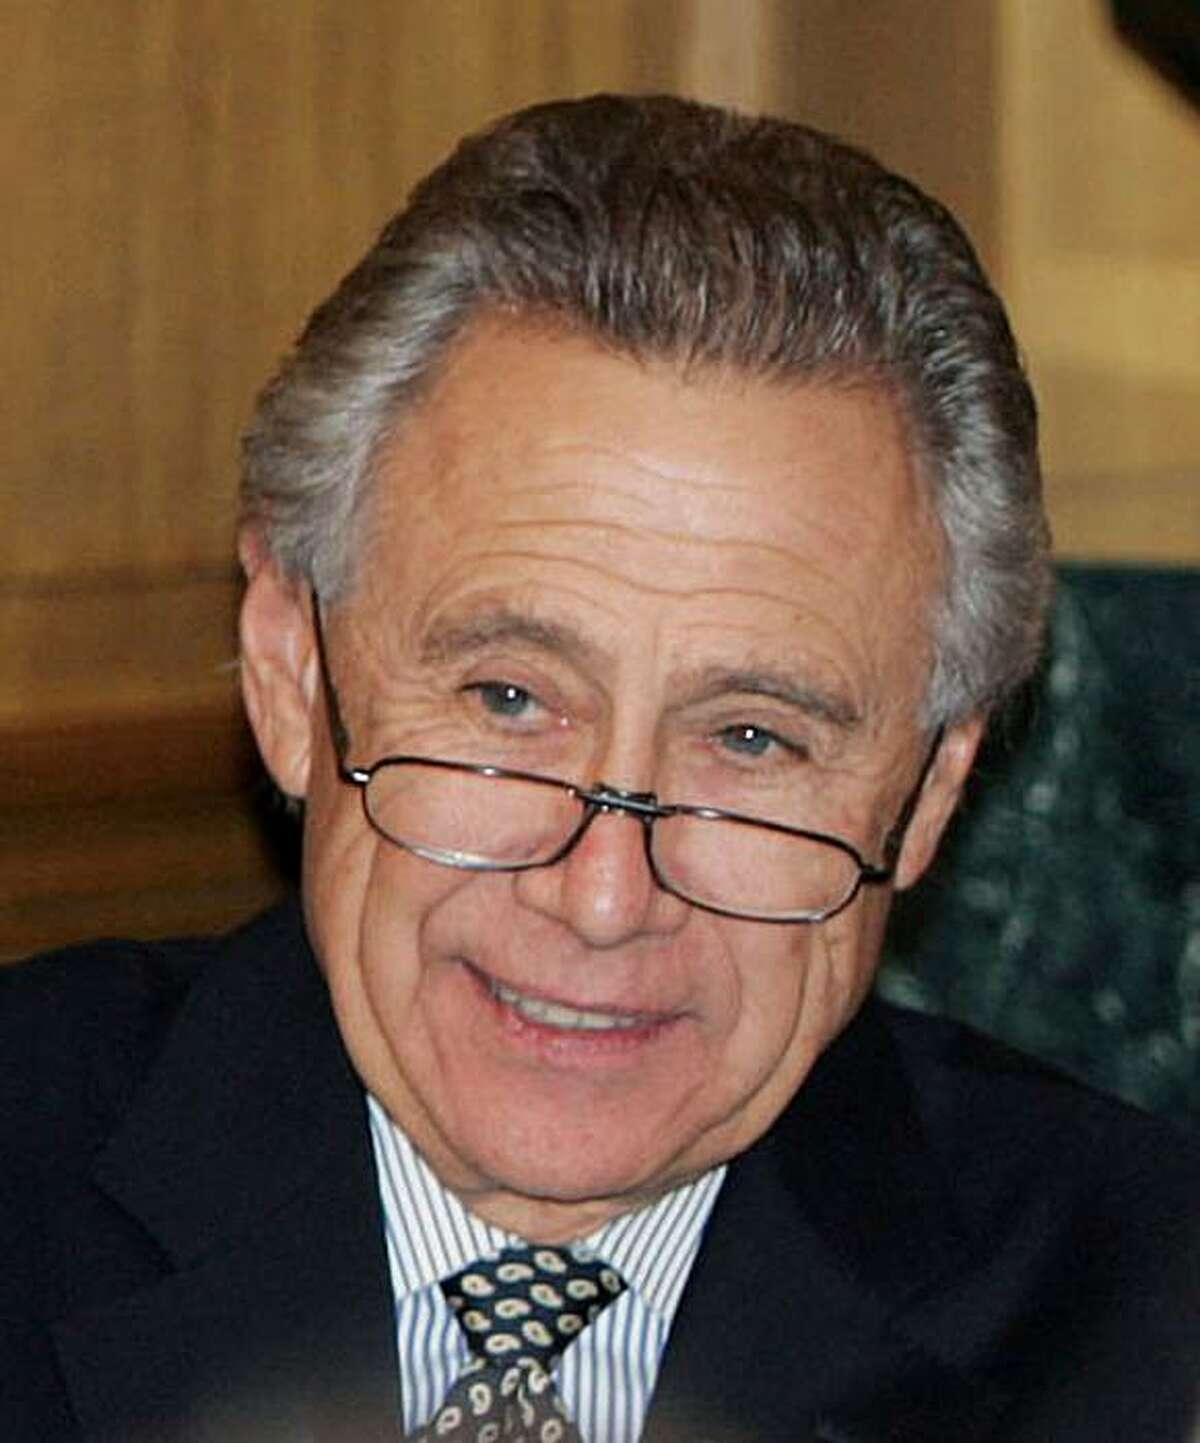 Philip F. Anschutz